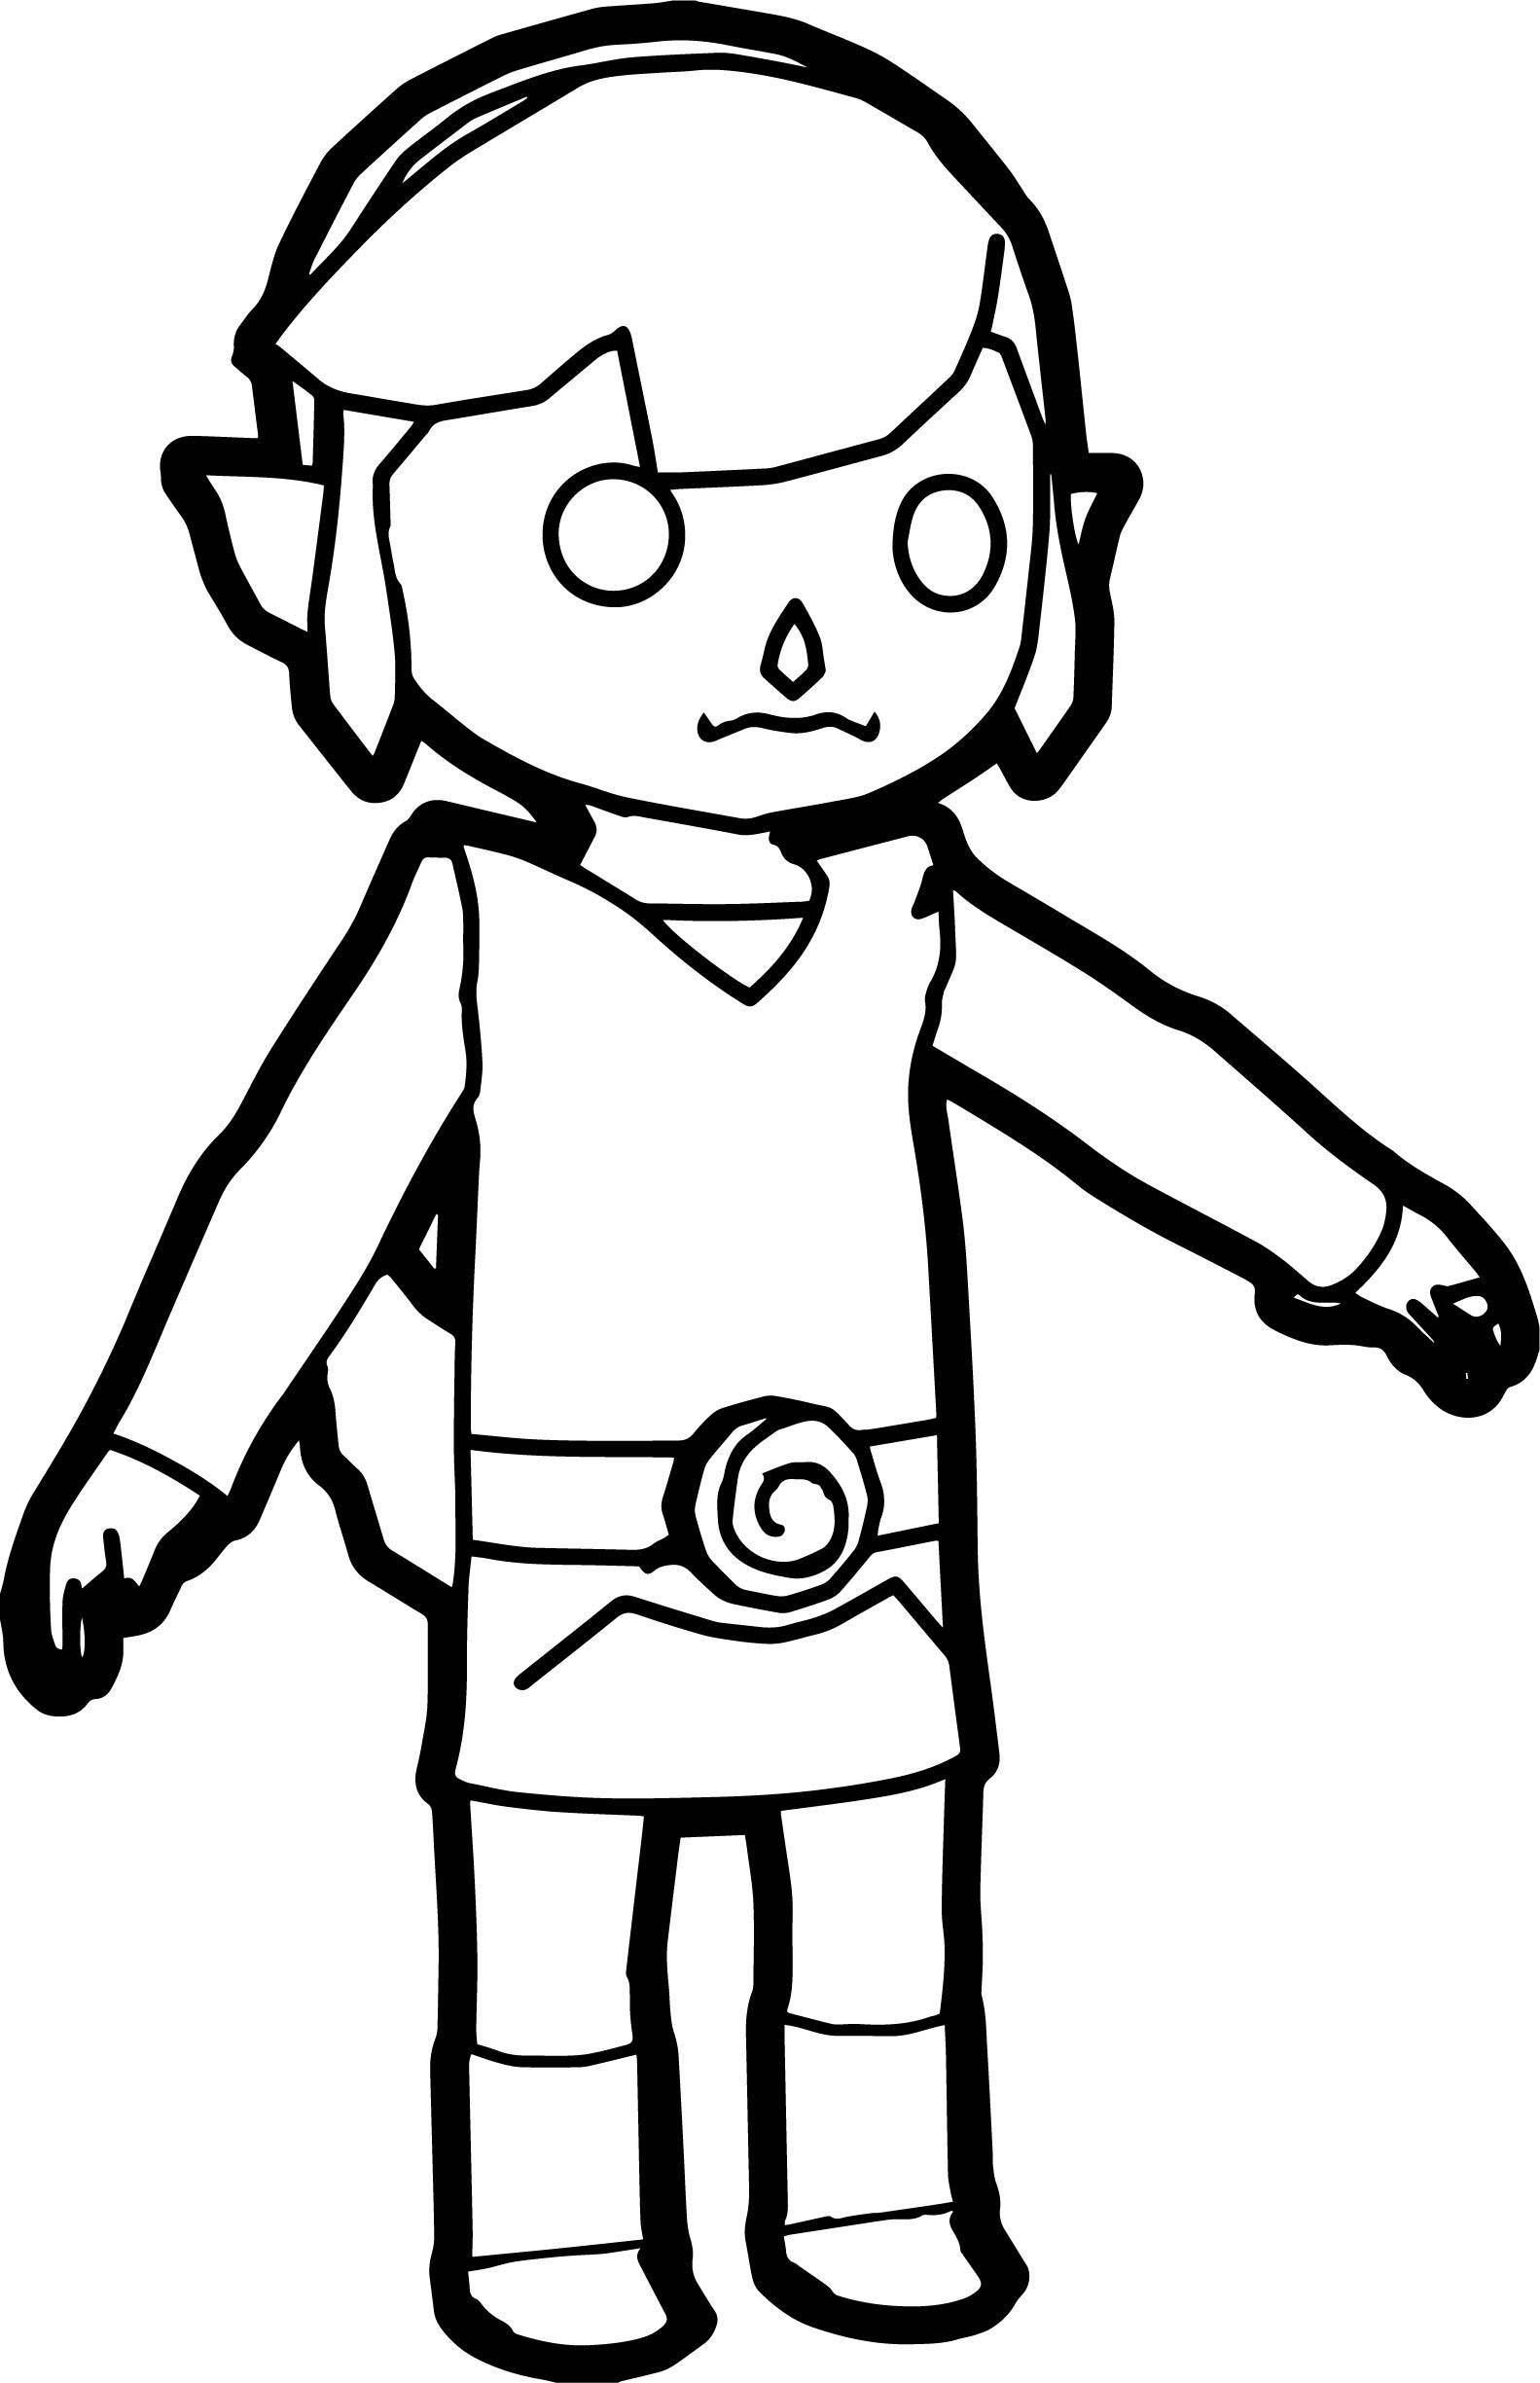 Koura Cartoon Coloring Page